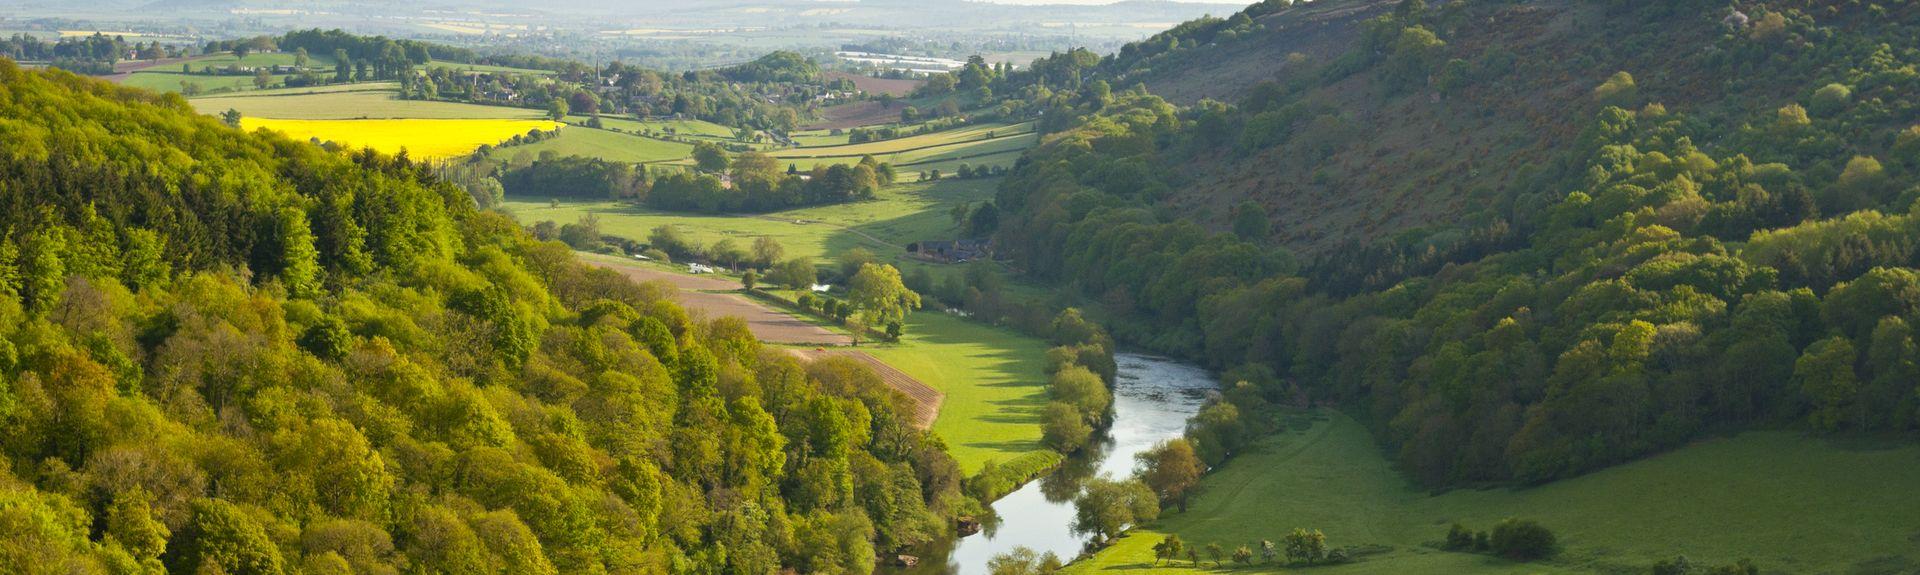 Herefordshire (county), England, United Kingdom